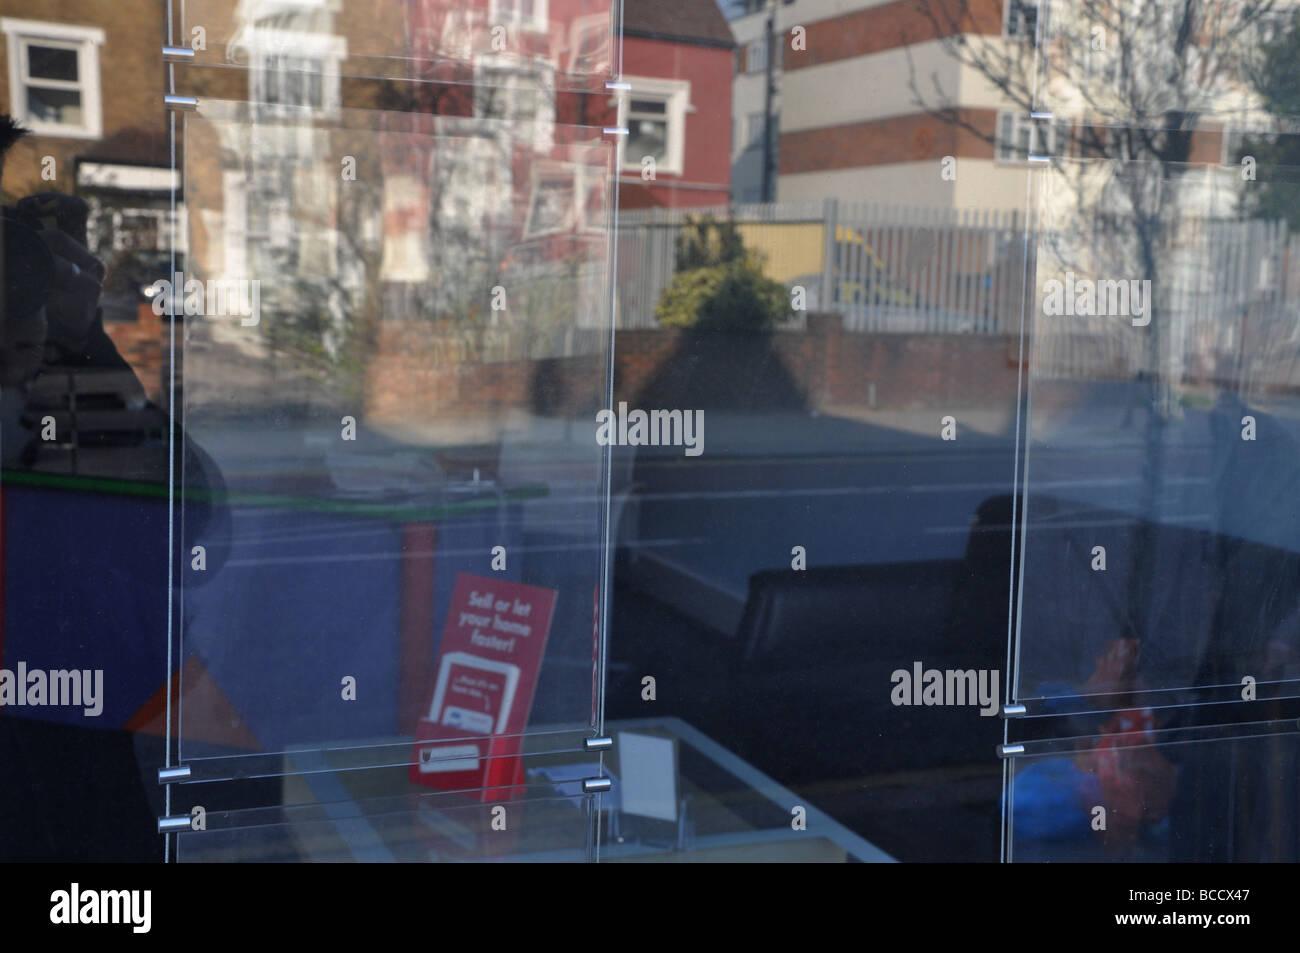 empty shops on Green Lanes, Haringey - Stock Image